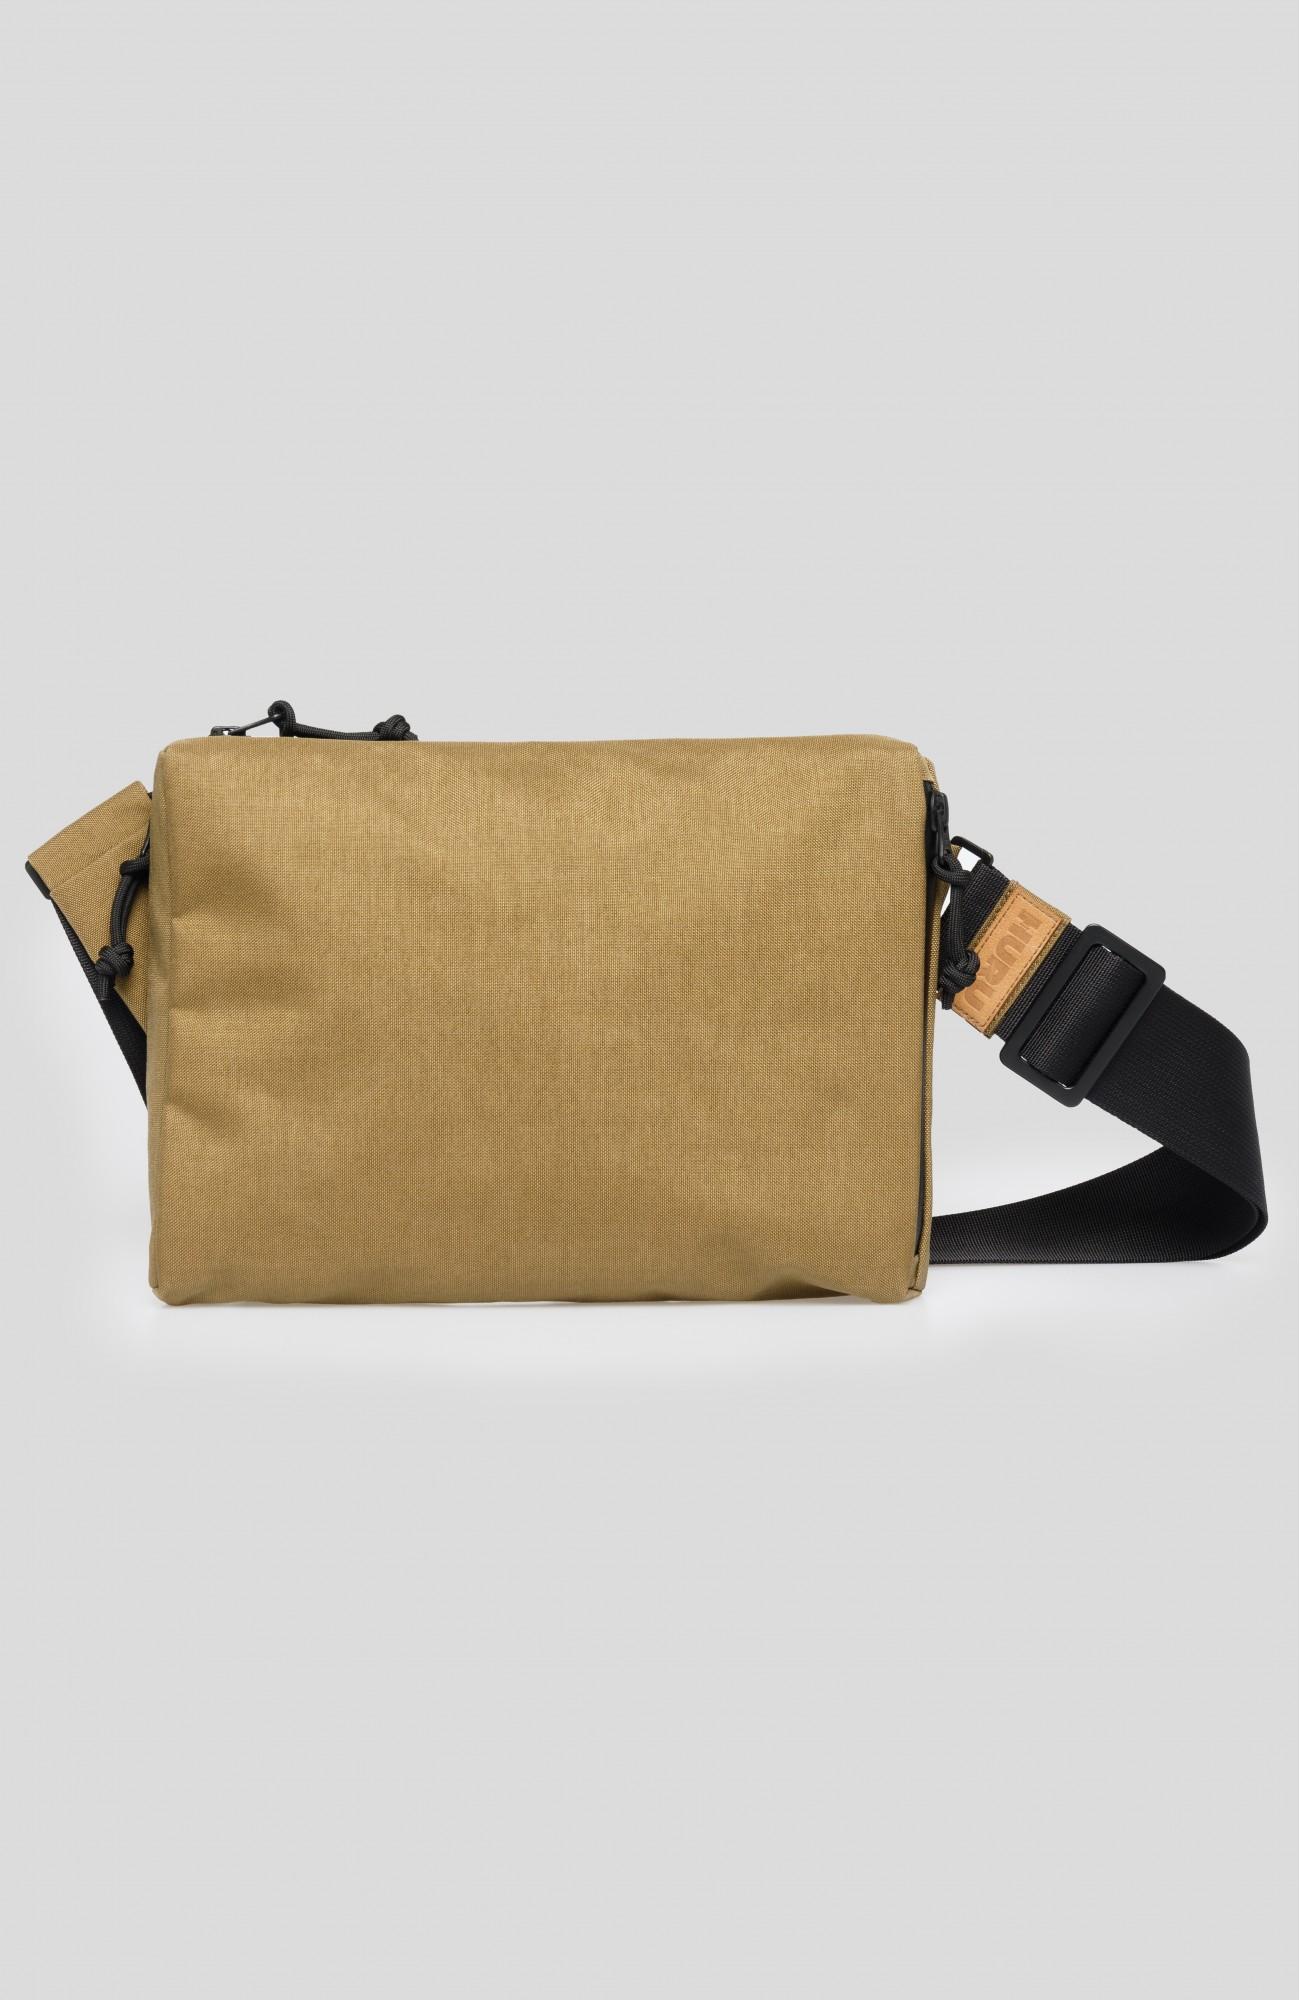 Messenger HURU, brown